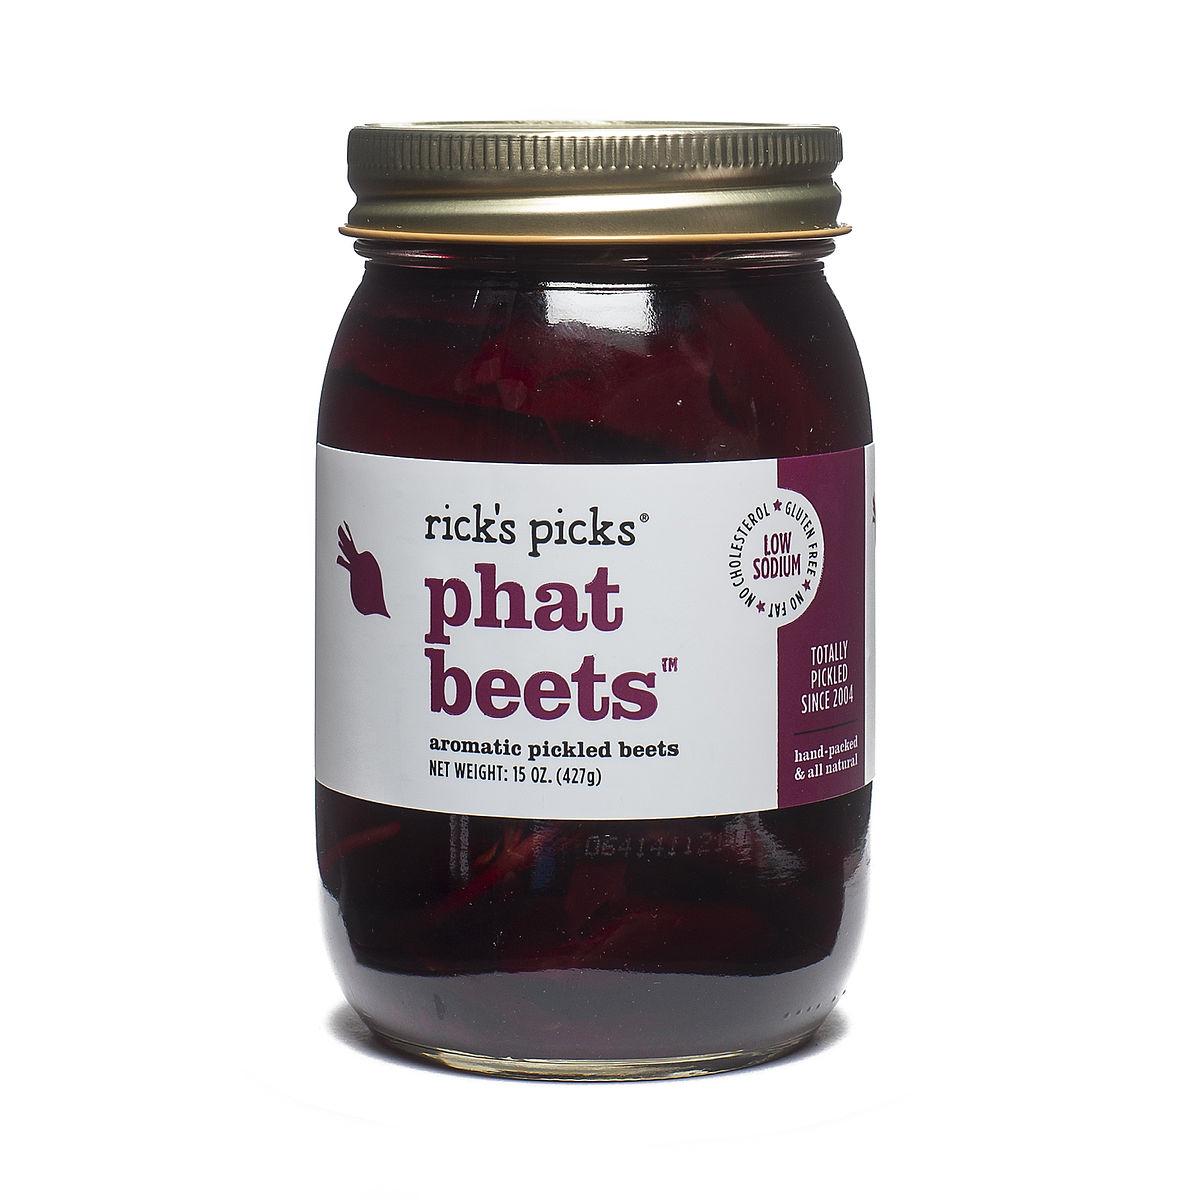 Ricks Picks Phat Beets Aromatic Pickled Beets - Thrive Market